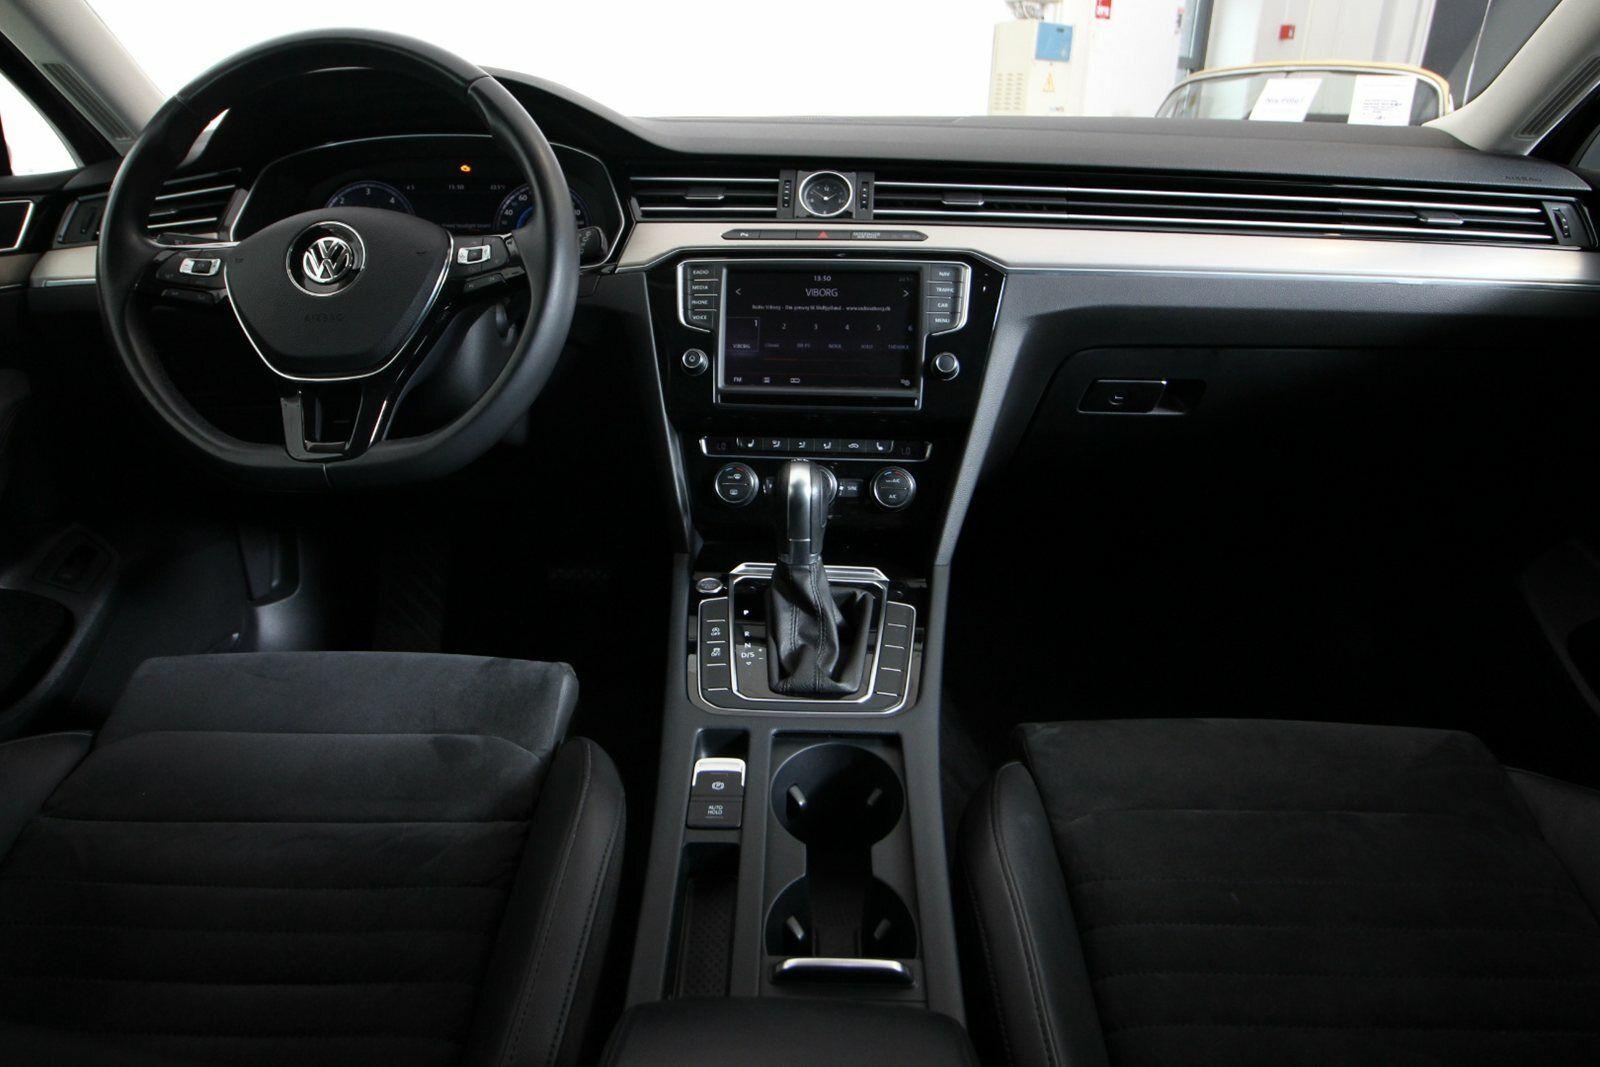 VW Passat TDi 190 Highl. Variant DSG